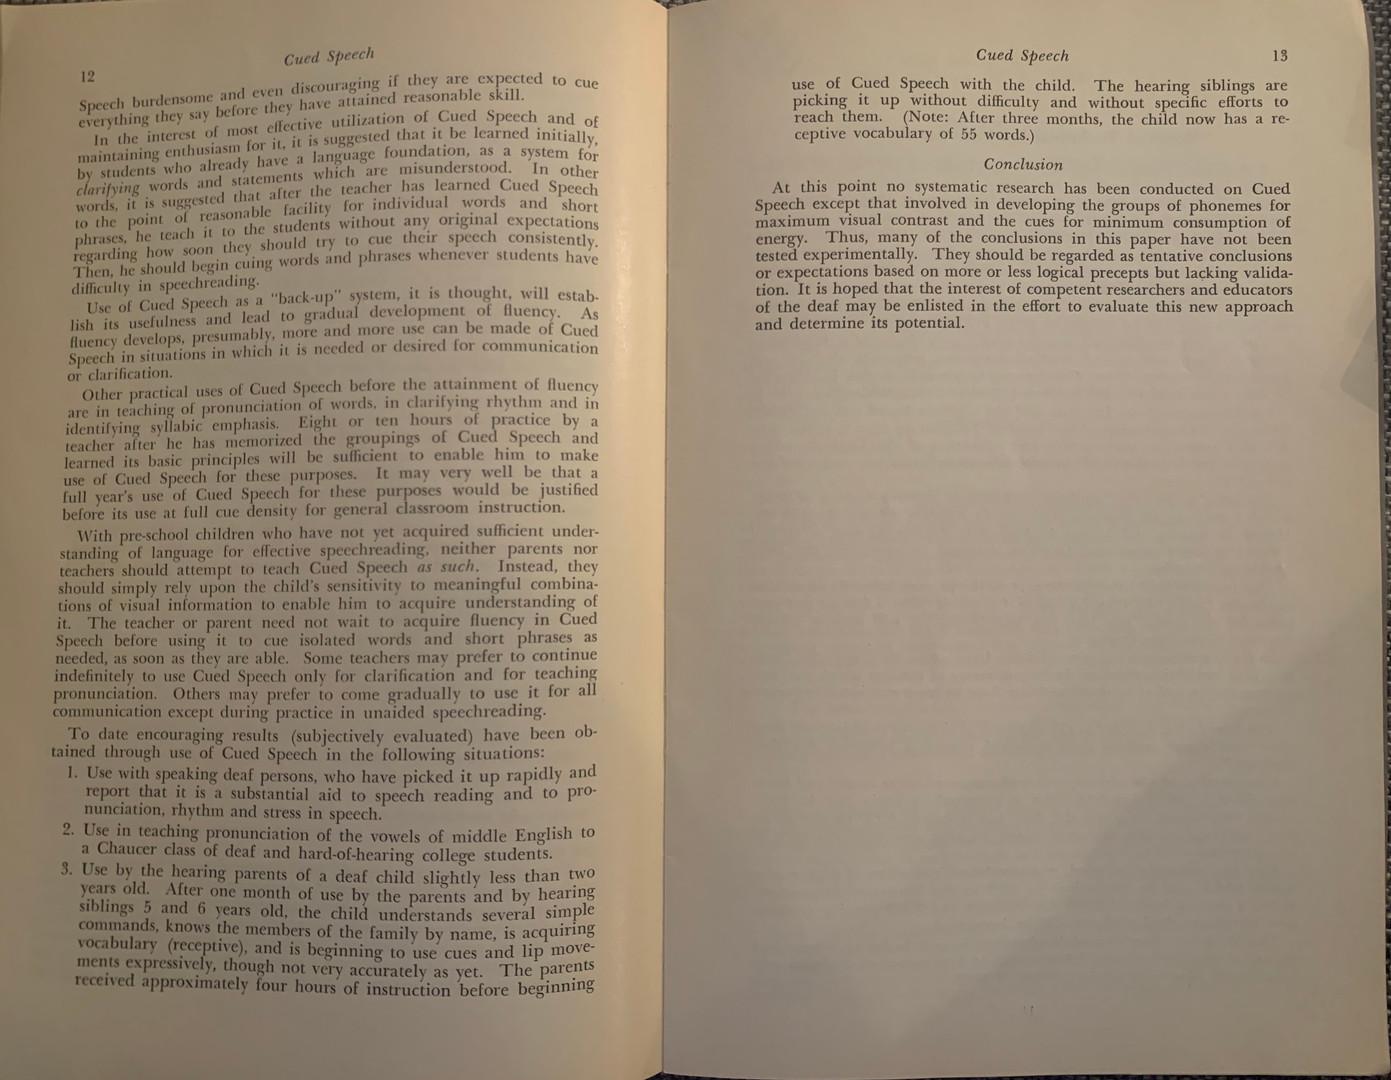 p.12-13 Original Article on Cued Speech